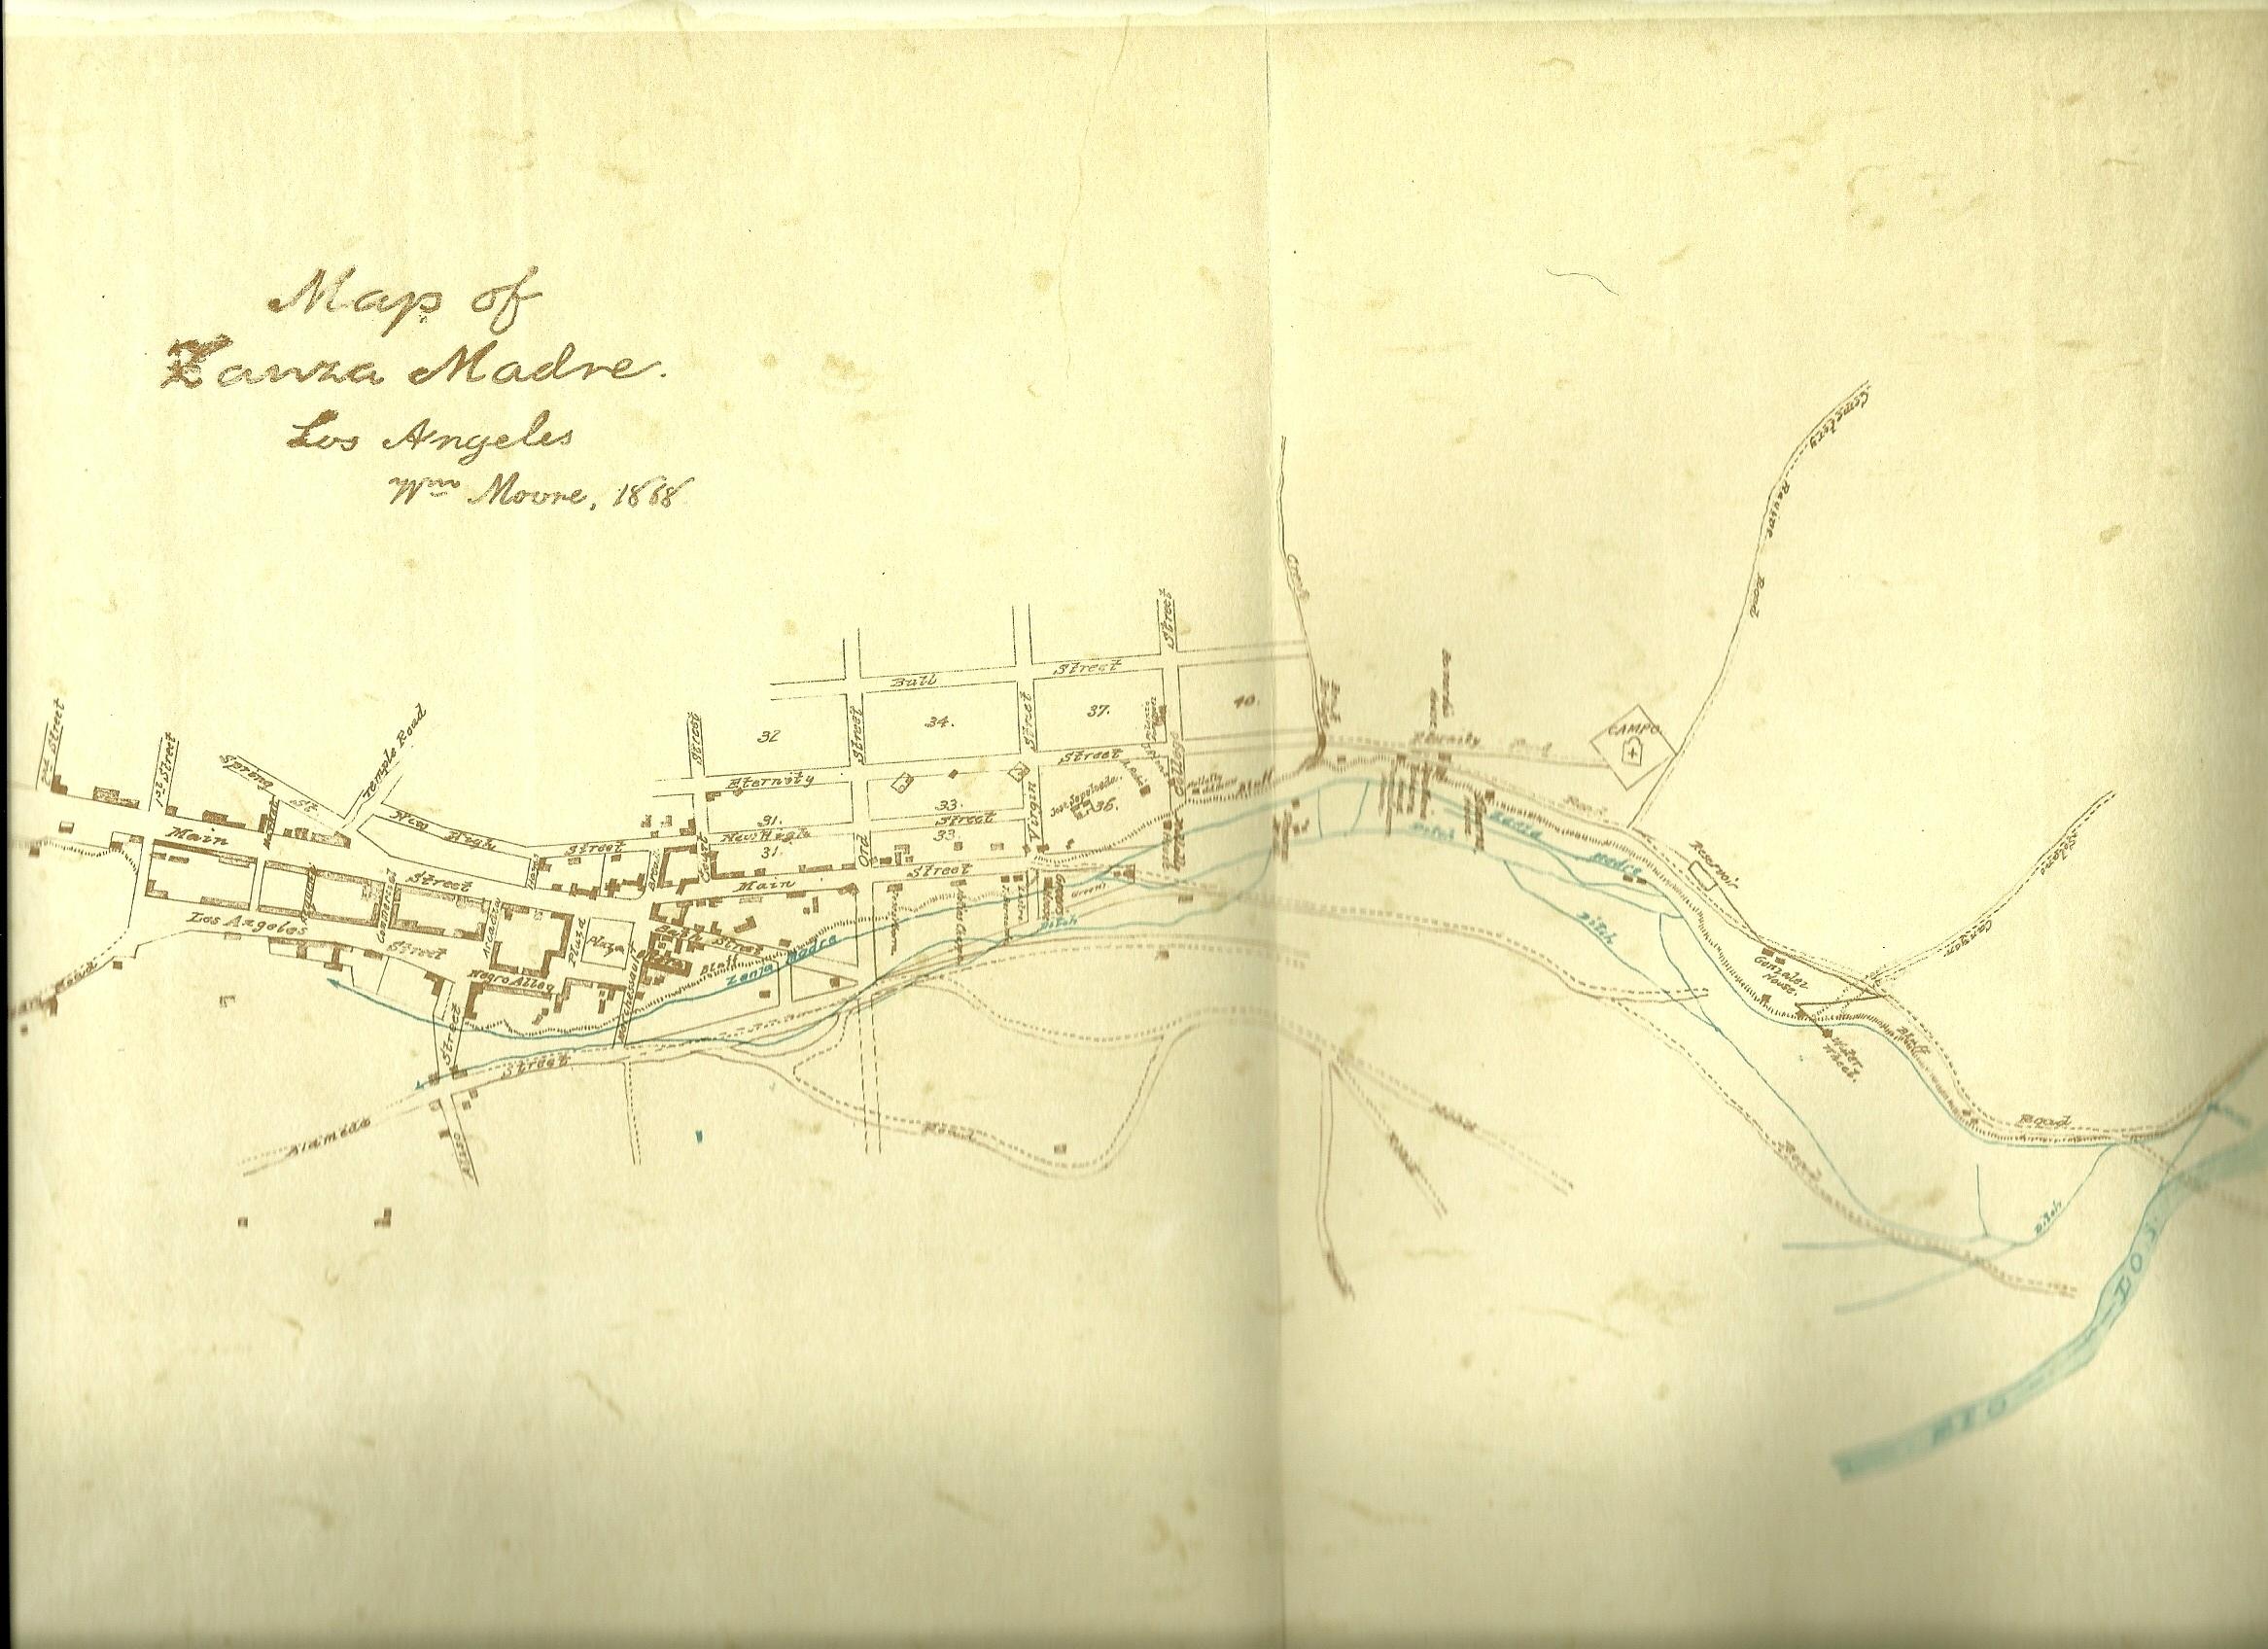 Zanja-Madre-map-1868.jpg